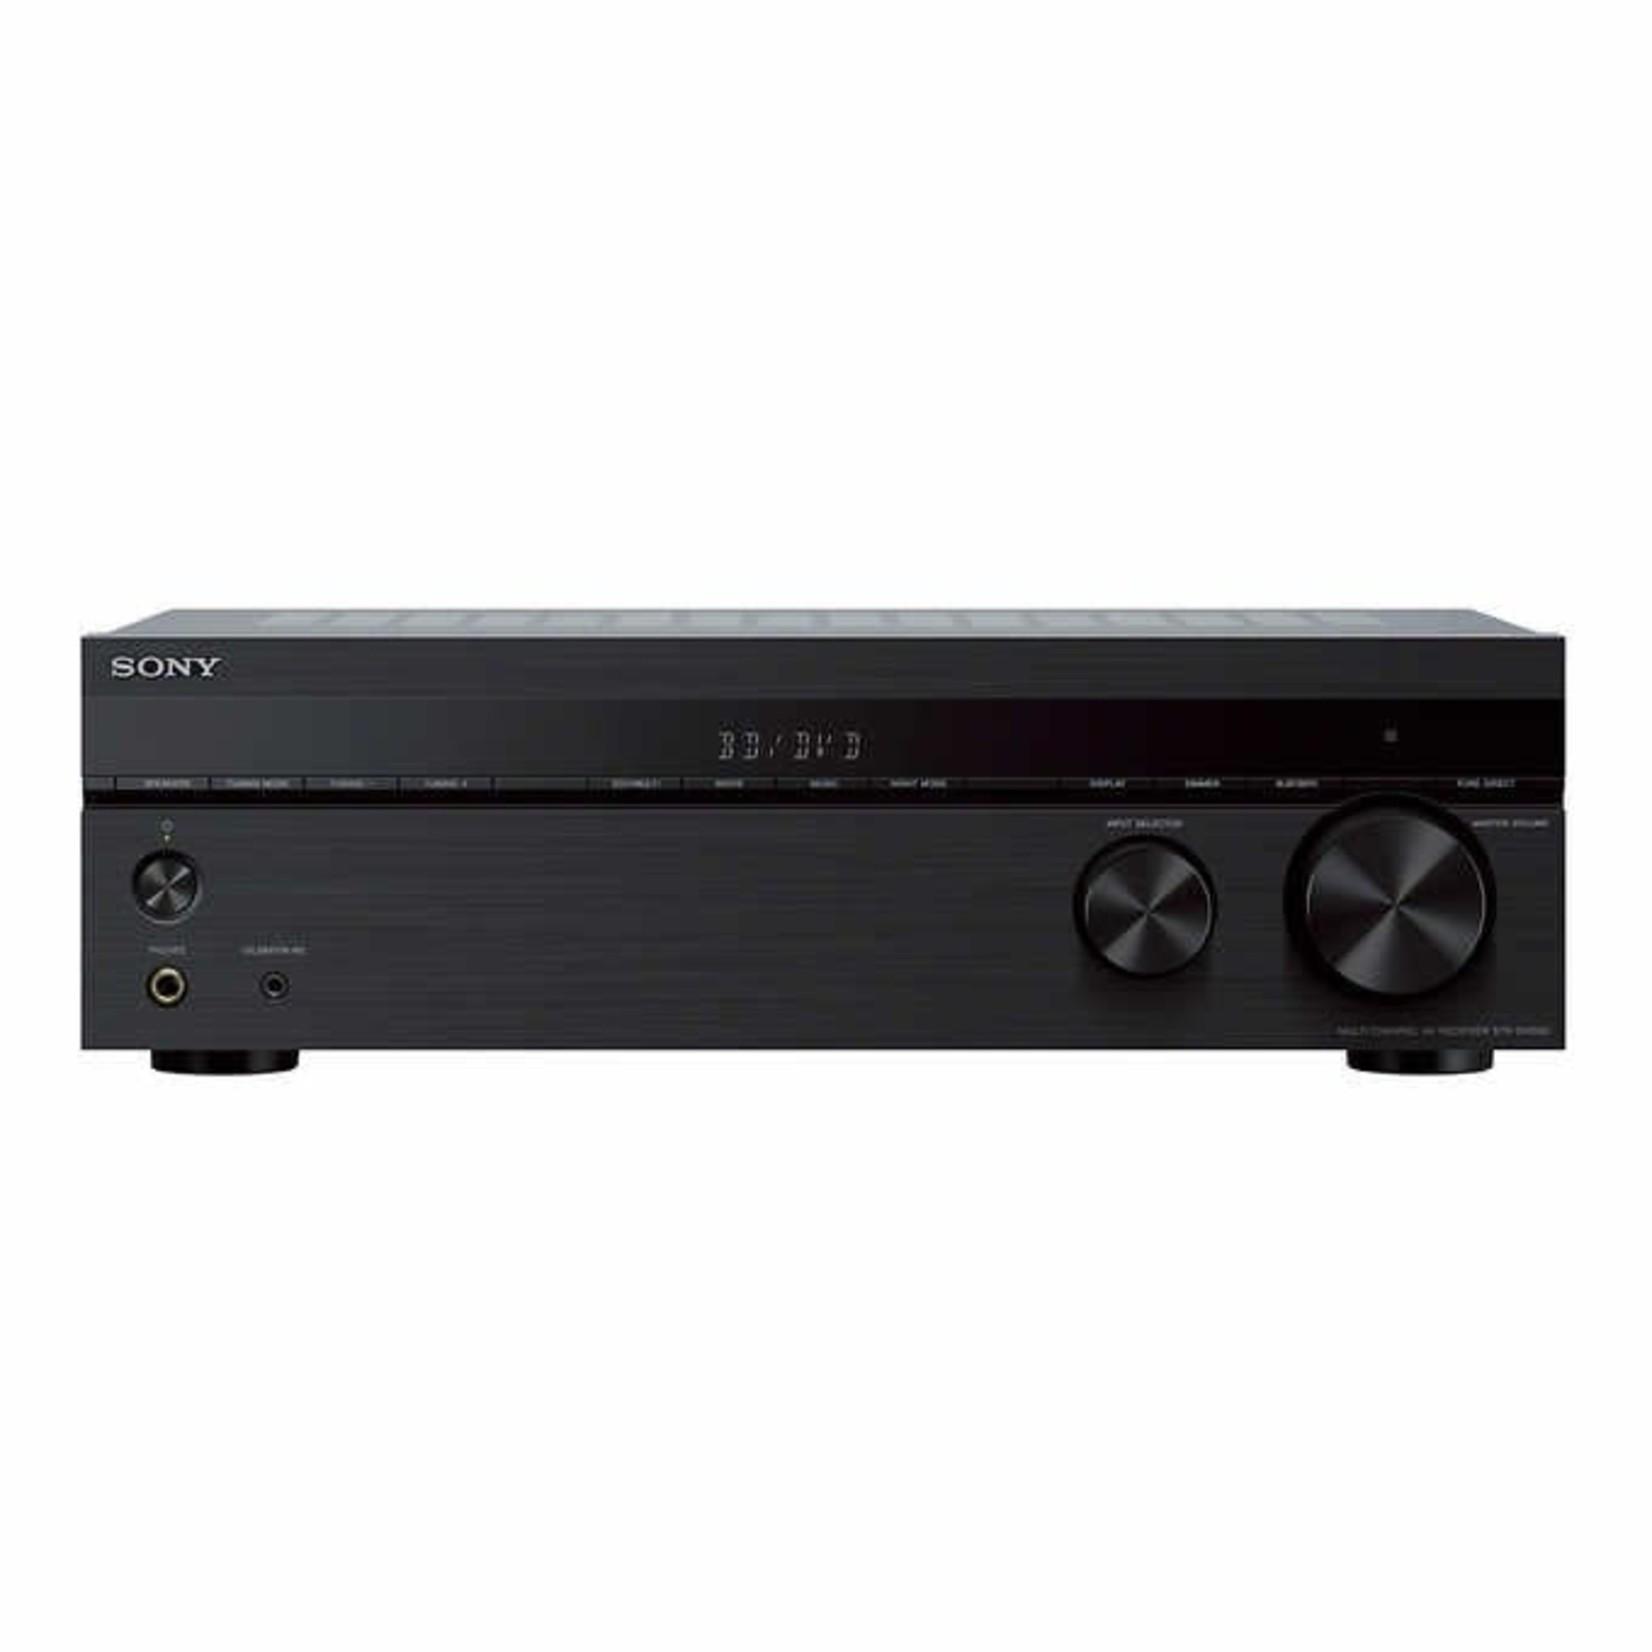 Sony STRDH590 5.2 Channel 4K HDR AV Receiver *Open box